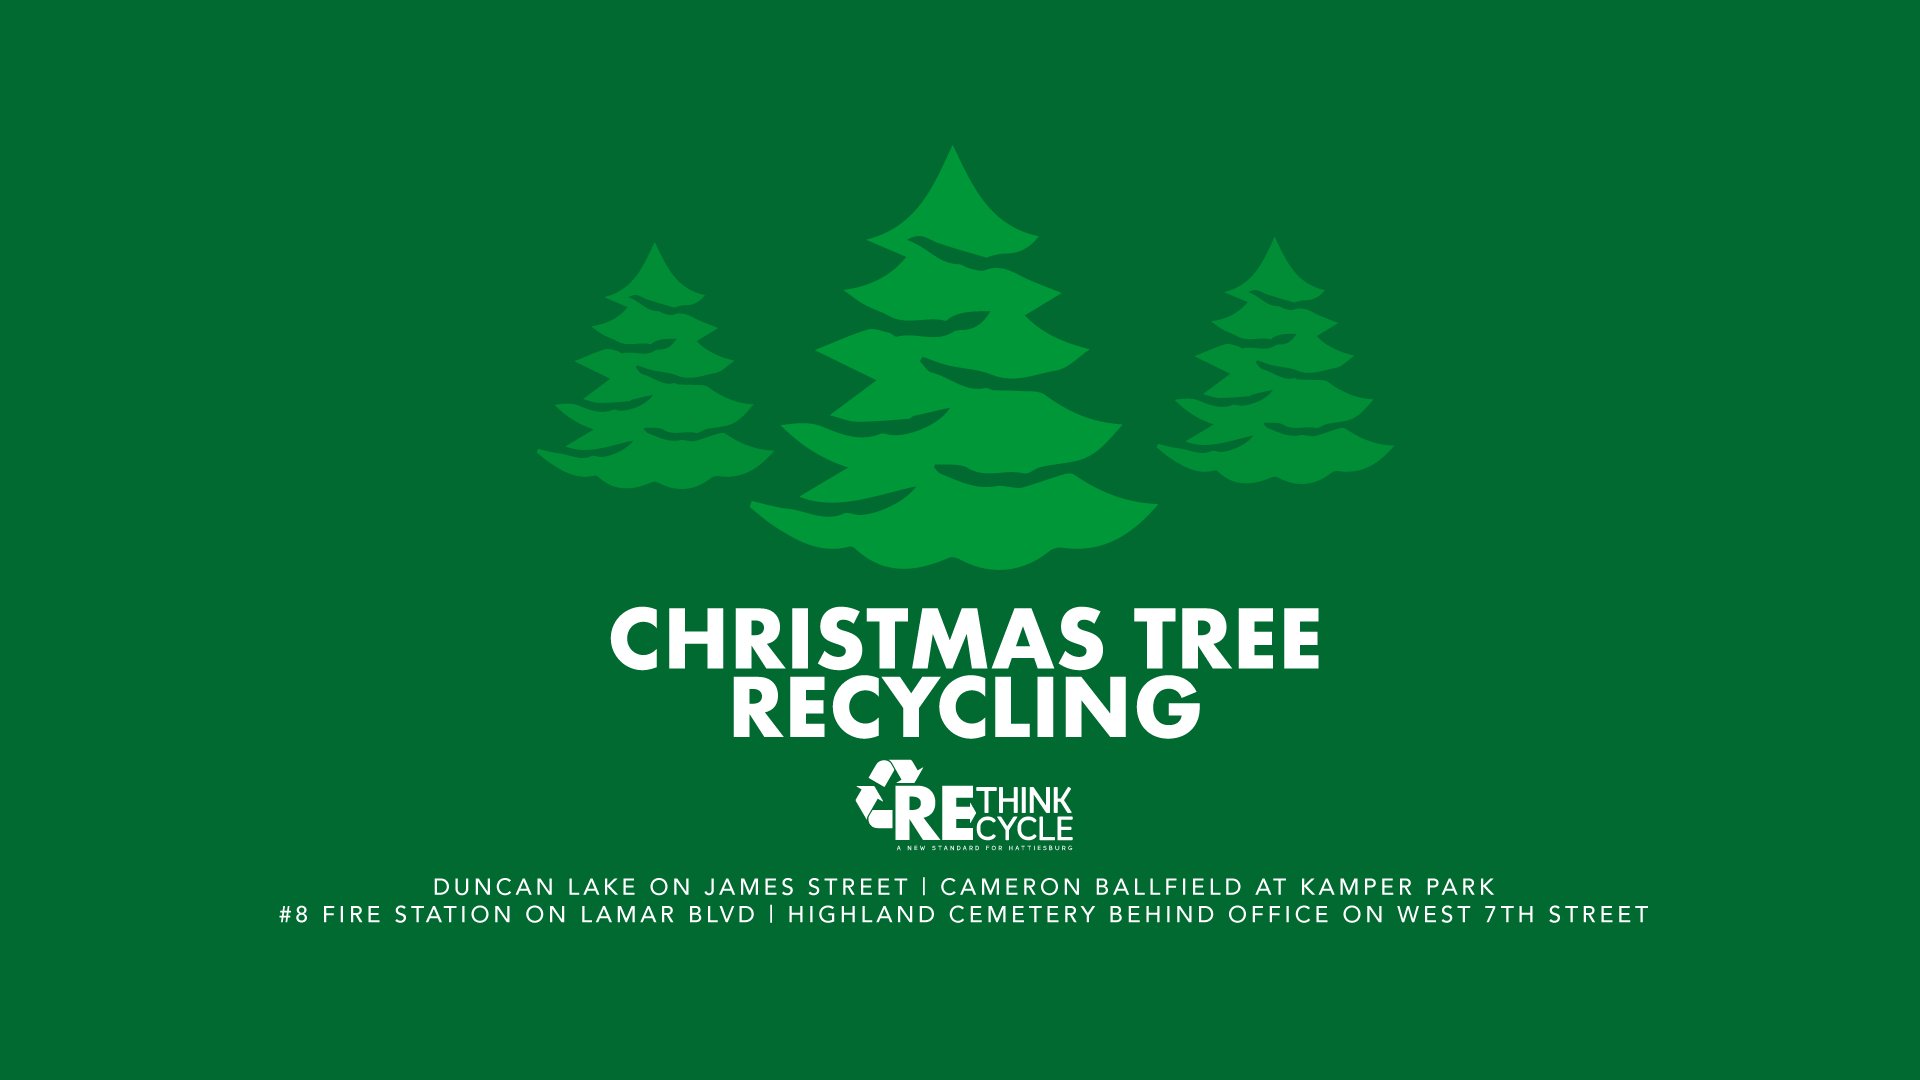 Christmas Tree Recycling Near Me.Christmas Tree Recycling City Of Hattiesburg